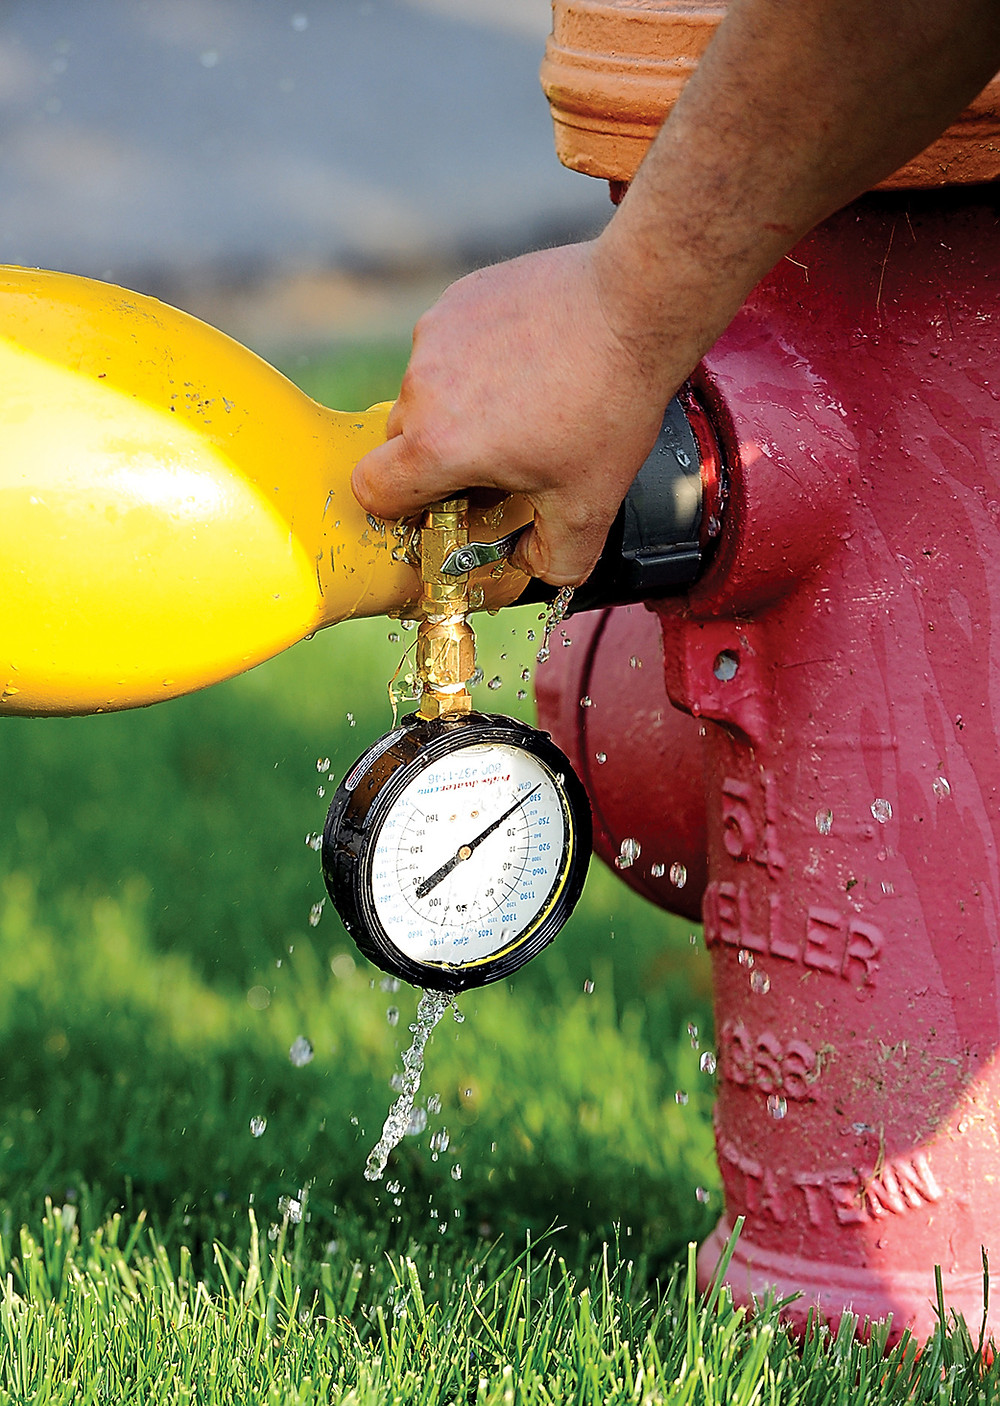 04-05 Hydrant flushing 2 3547.jpg